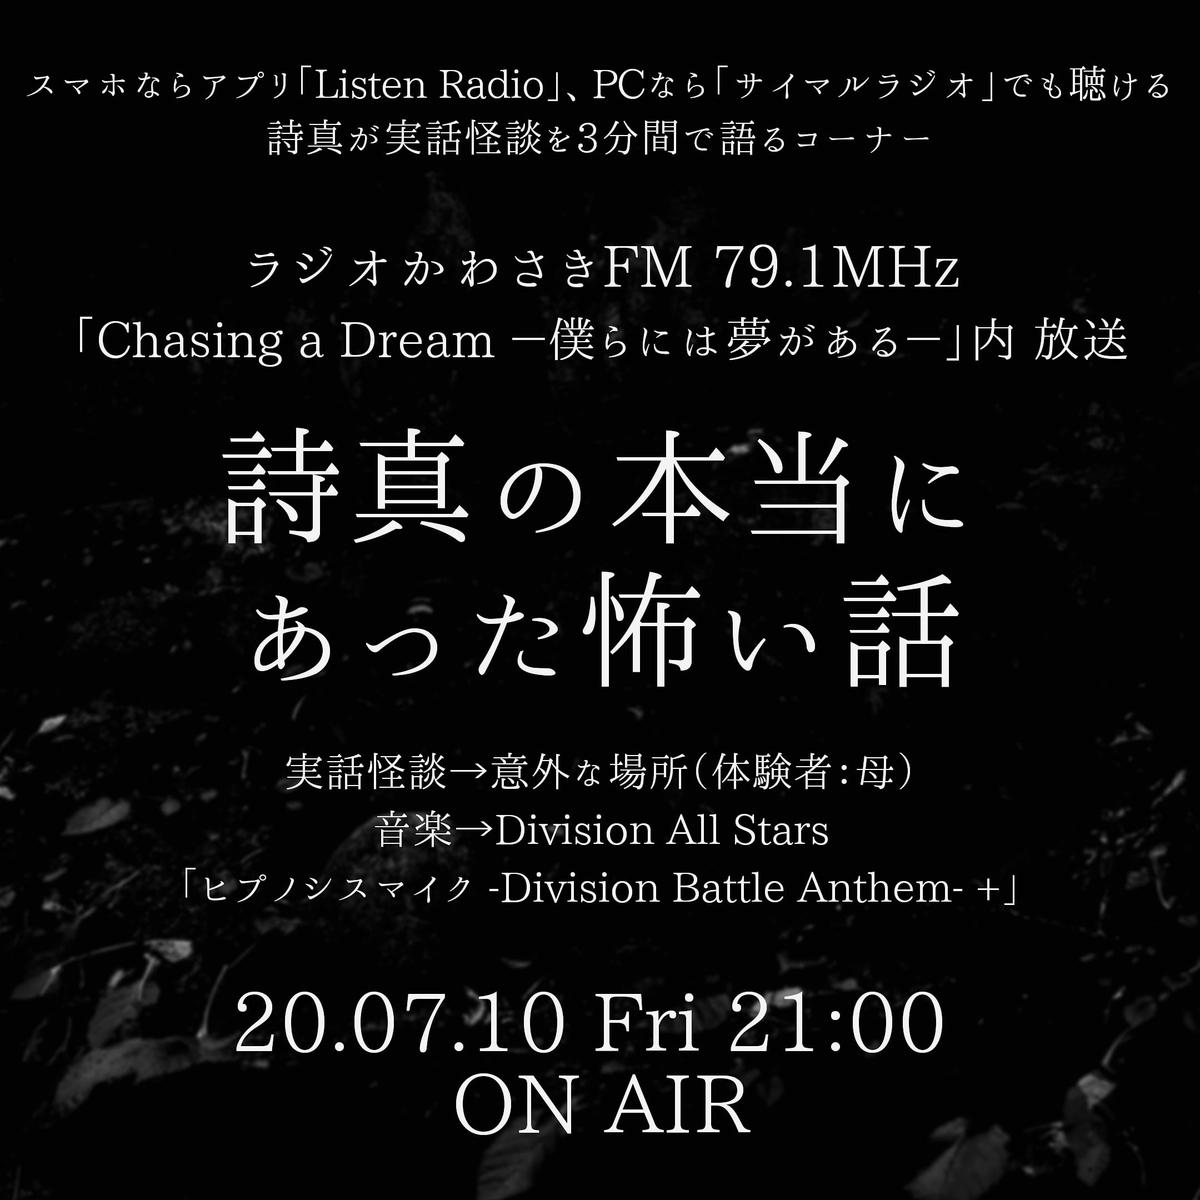 f:id:yukaitekietsu:20200717215938j:plain